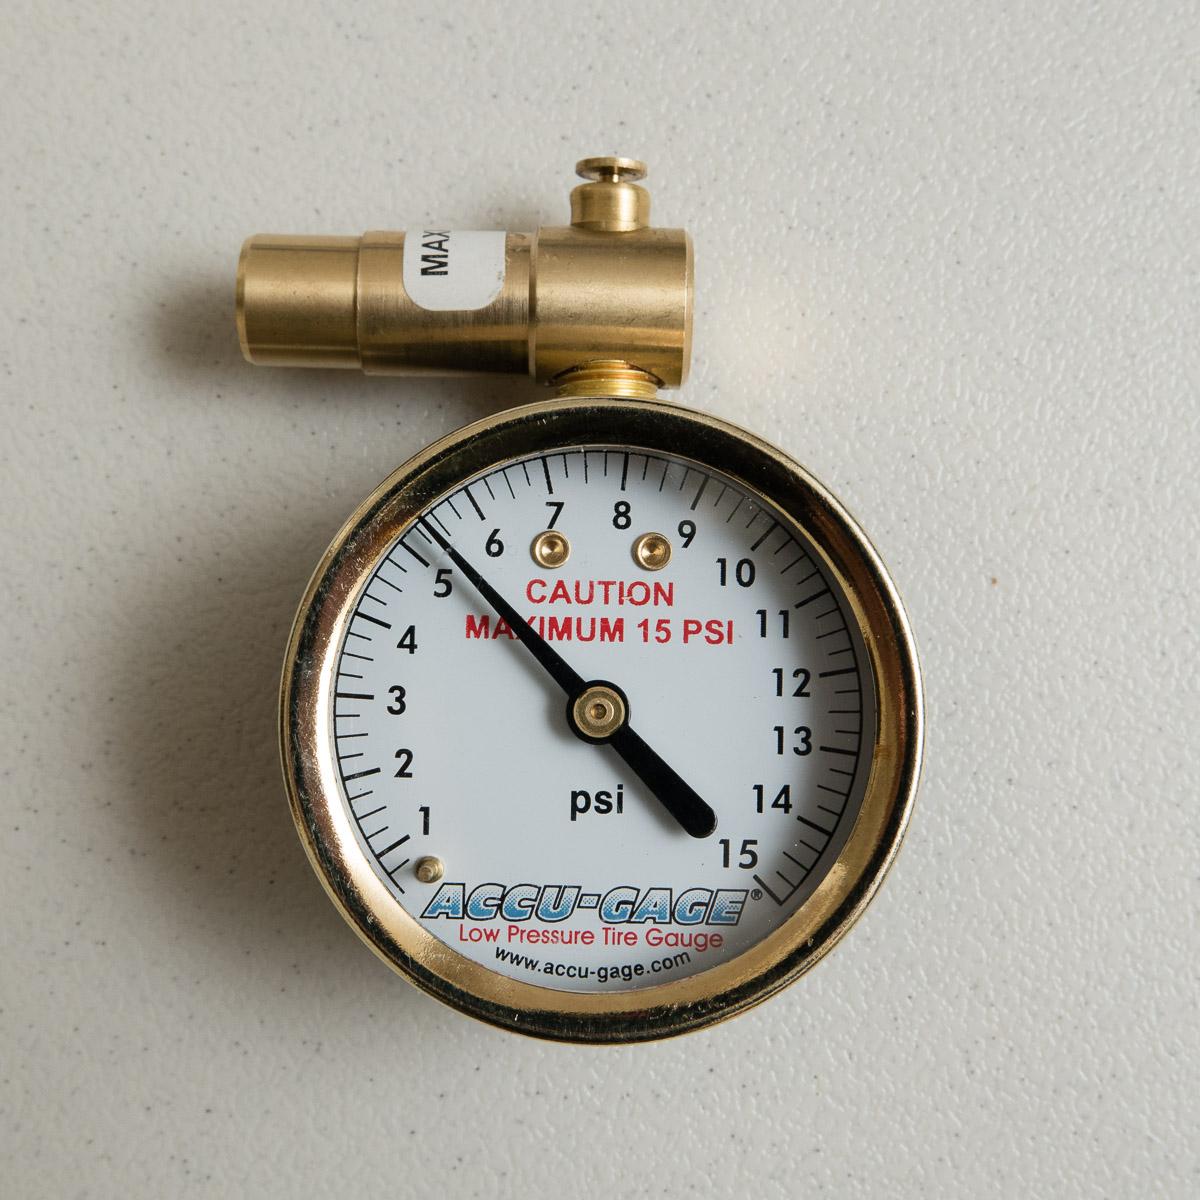 A sensitive pressure gauge for low pressure